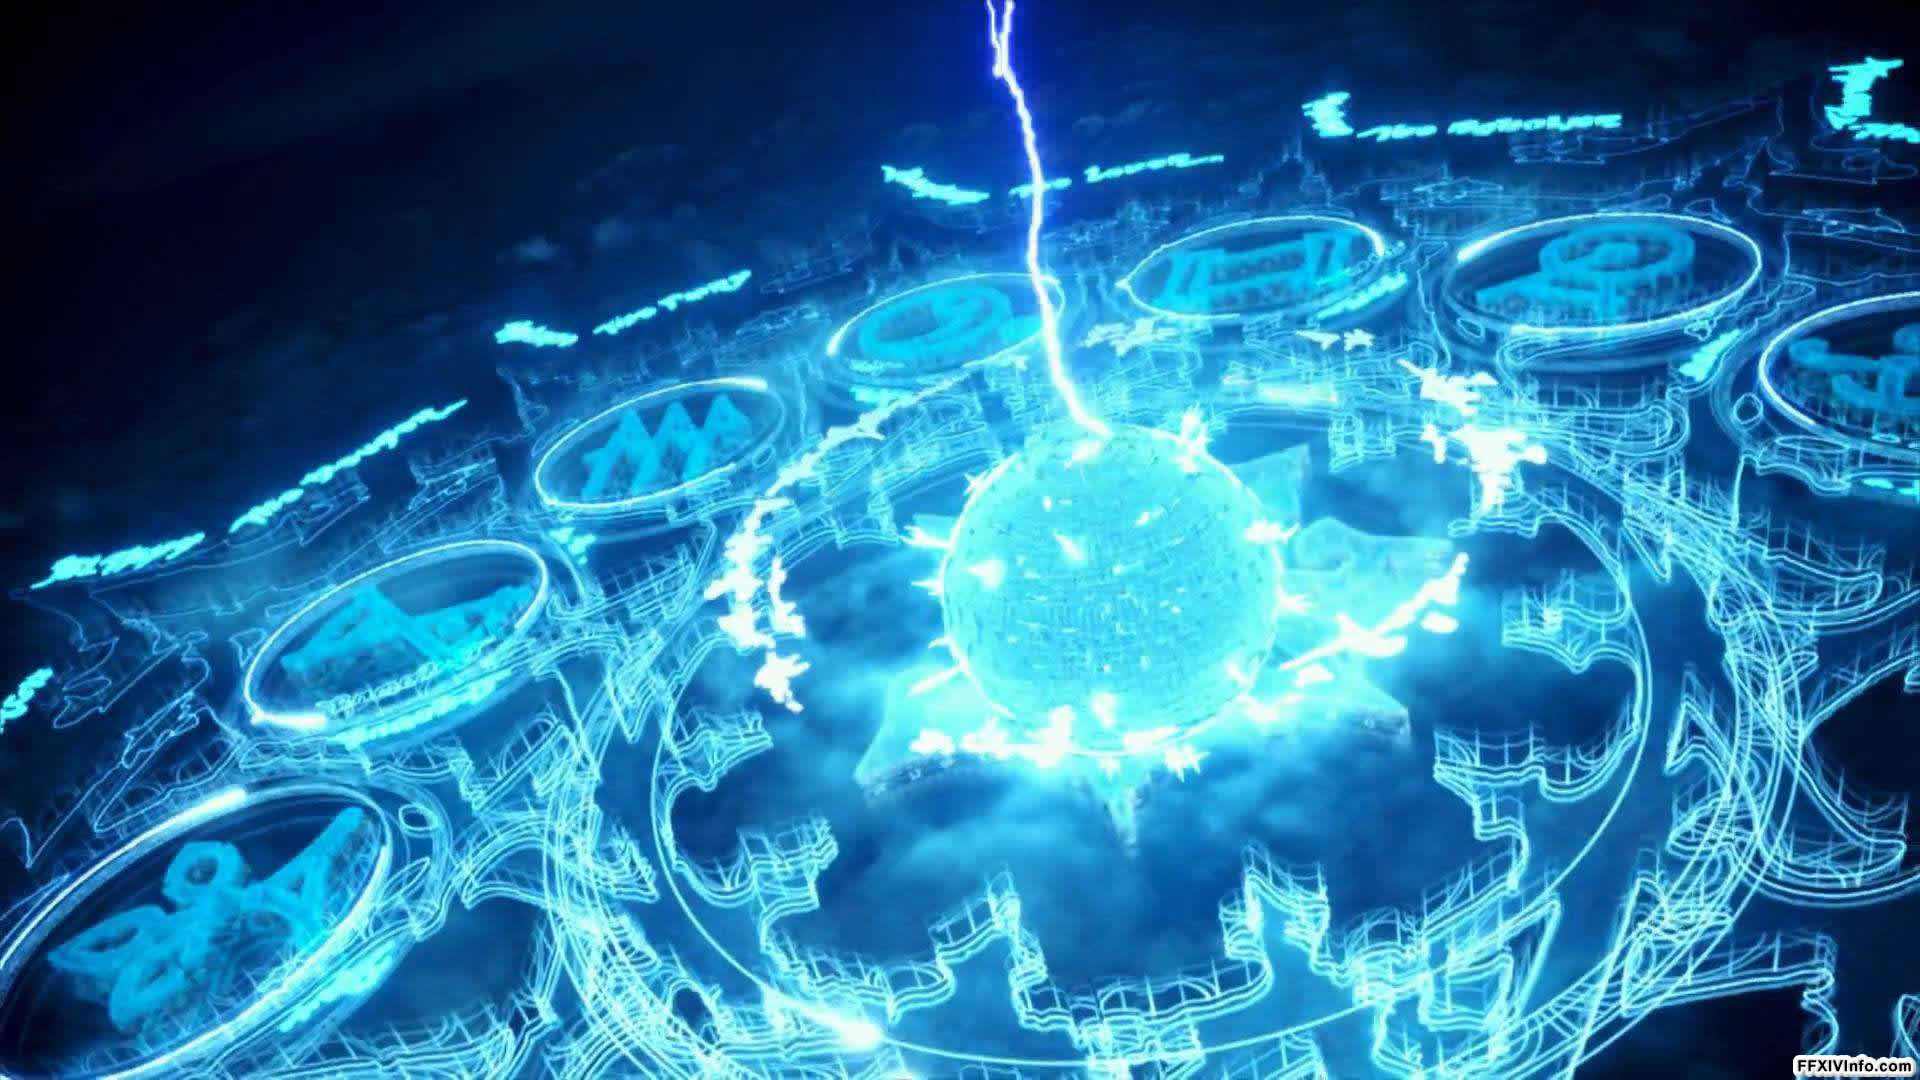 Final Fantasy XIV – A Realm Reborn Picture of the Day –  https://mmorpgwall.com/final-fantasy-xiv-a-realm-reborn-picture-of-the-day-54/  | MMORPGs | Pinterest …